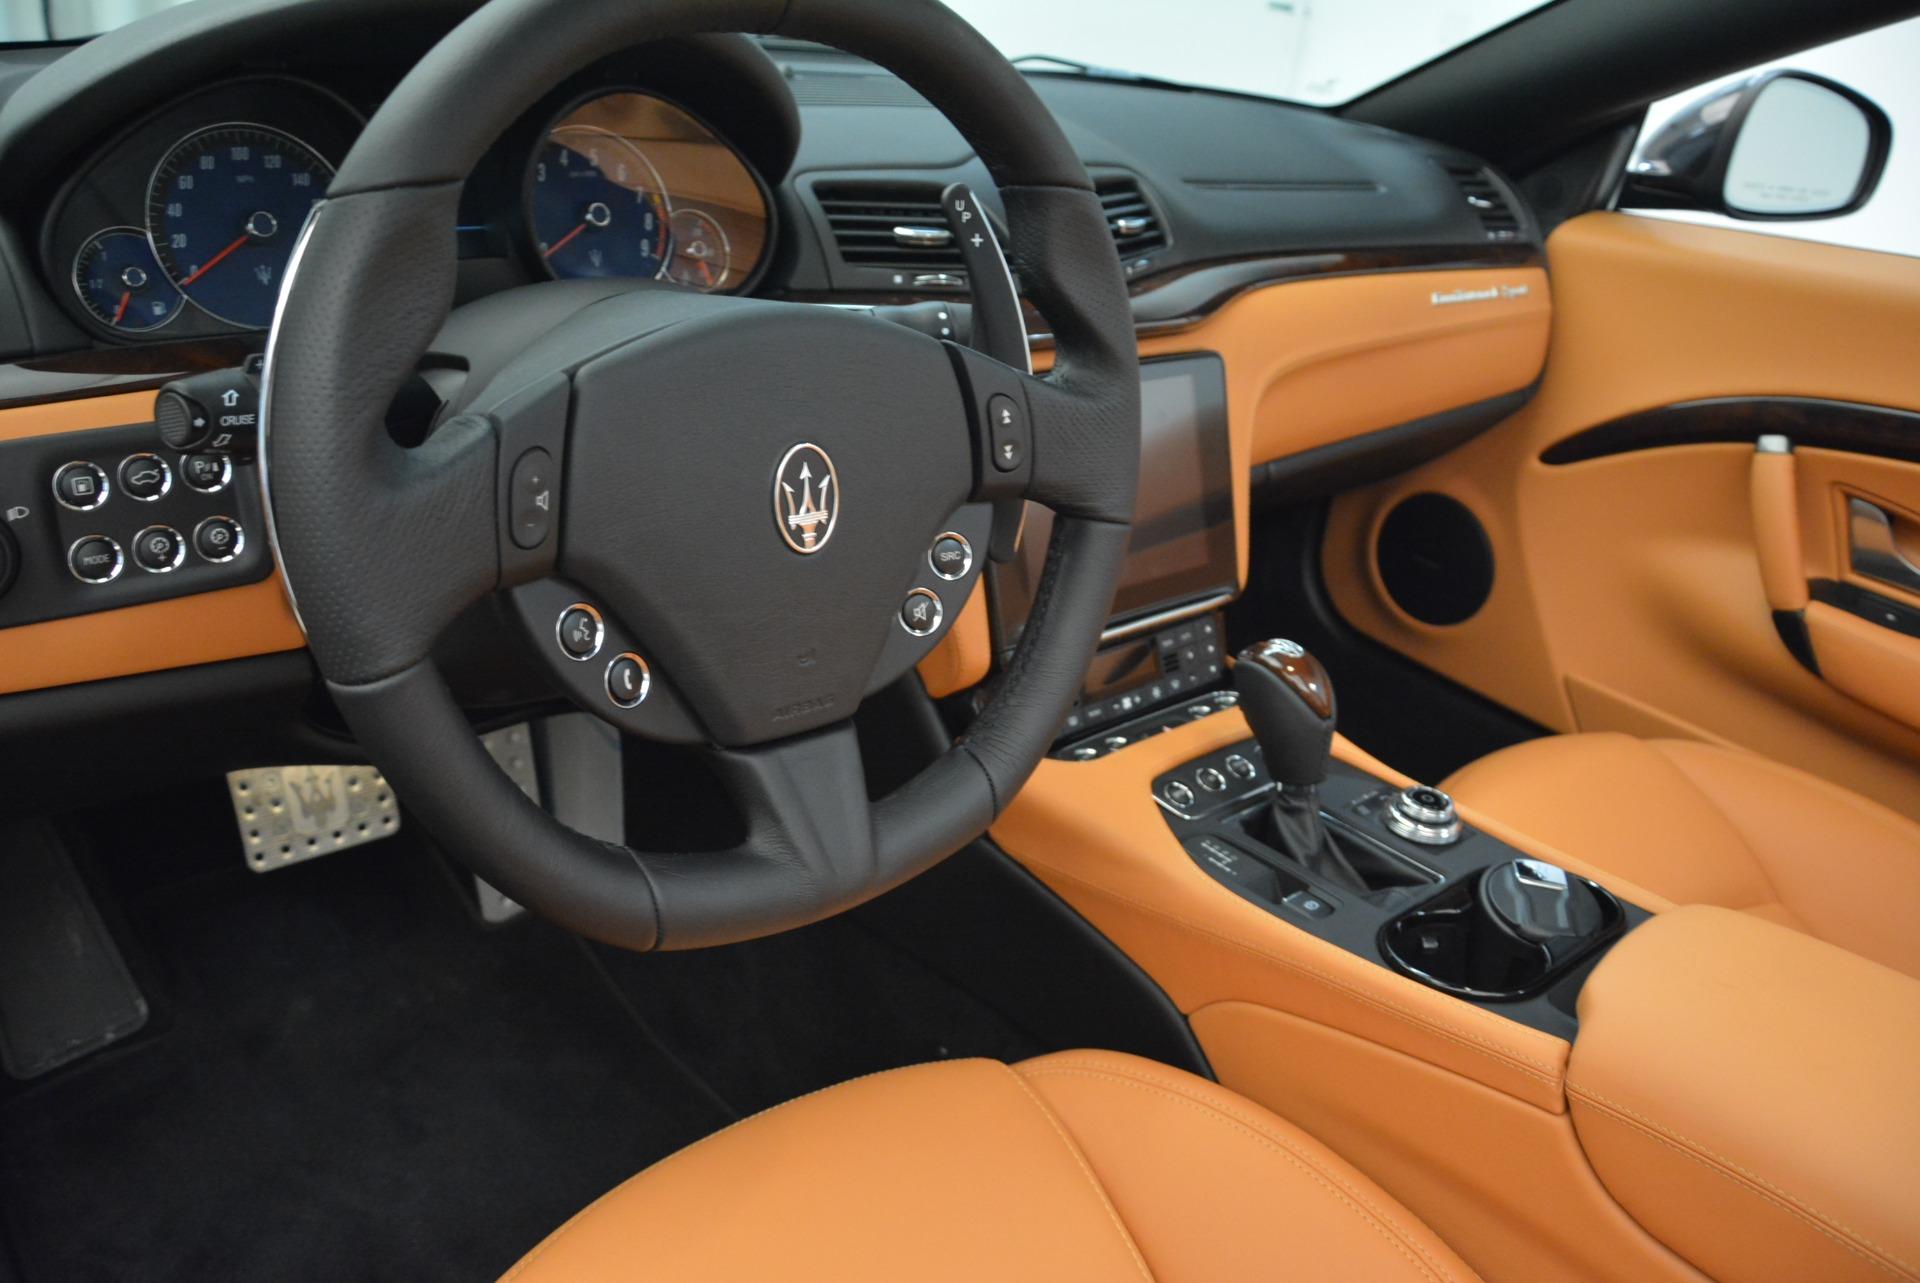 Used 2018 Maserati GranTurismo Sport Convertible For Sale In Westport, CT 1865_p26